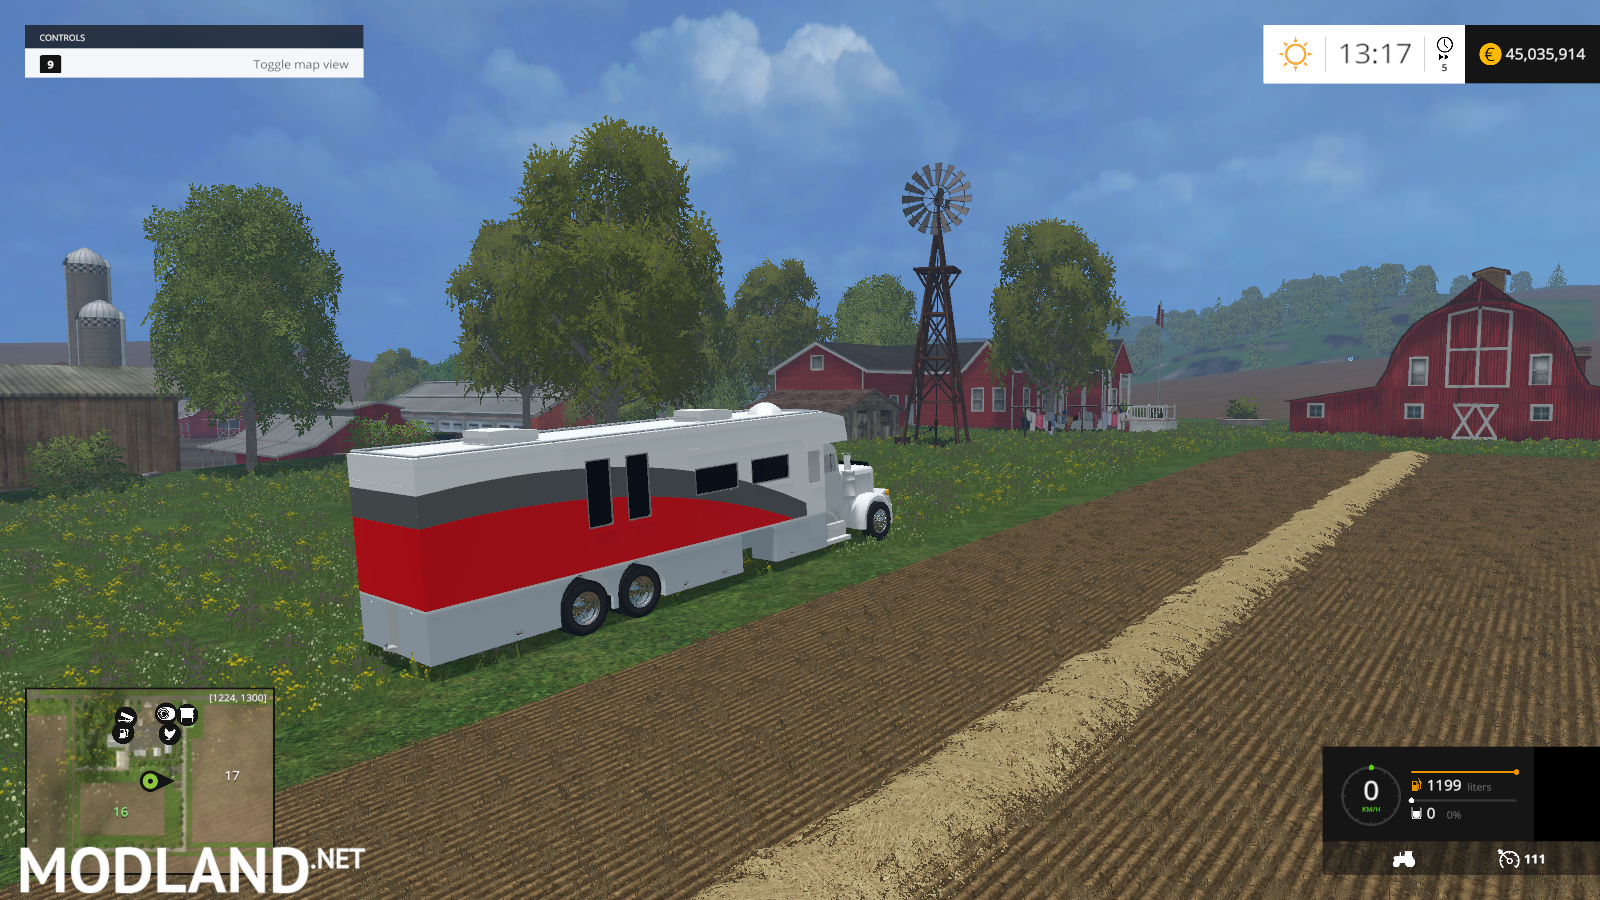 rv truck mod for Farming Simulator 2015 / 15 | FS, LS 2015 mod